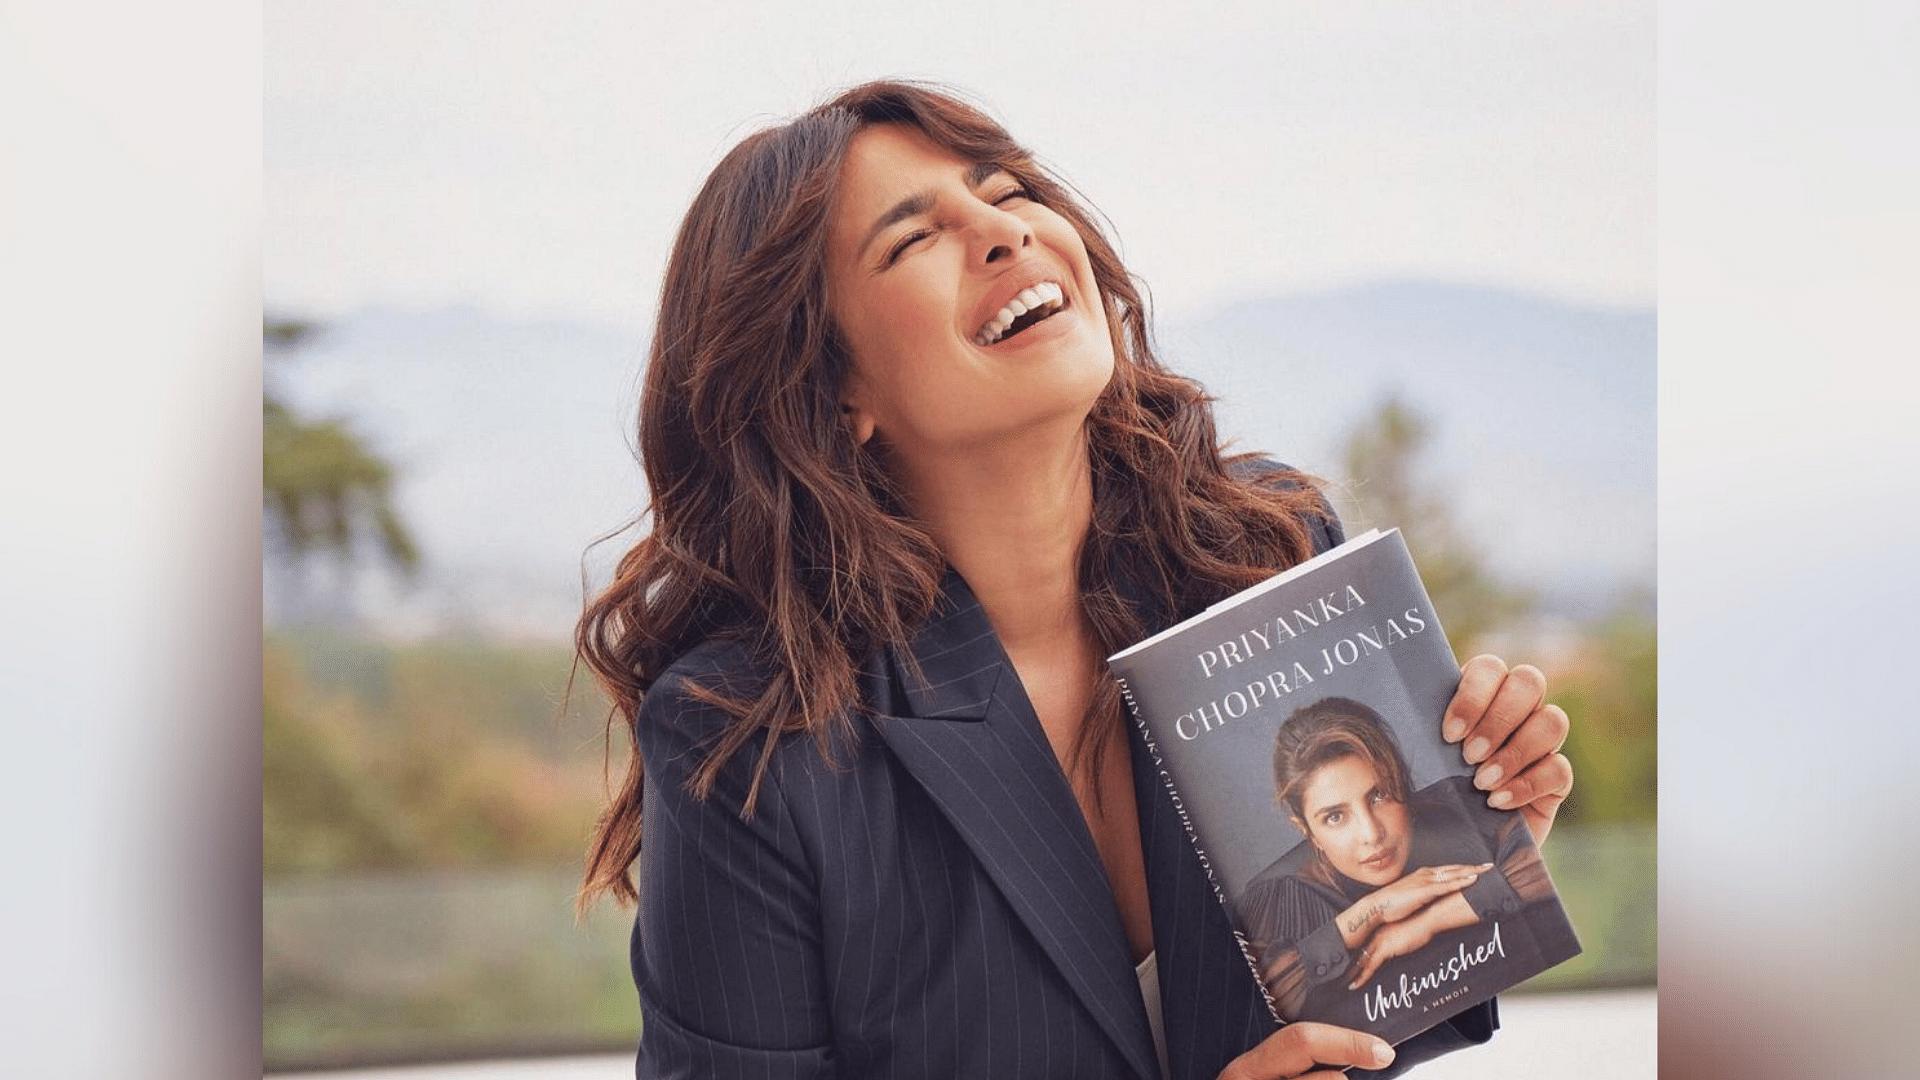 Priyanka Chopra Book Unfinished Review: Priyanka Chopra's 'Unfinished' is Measured, Engaging & Full of Humour